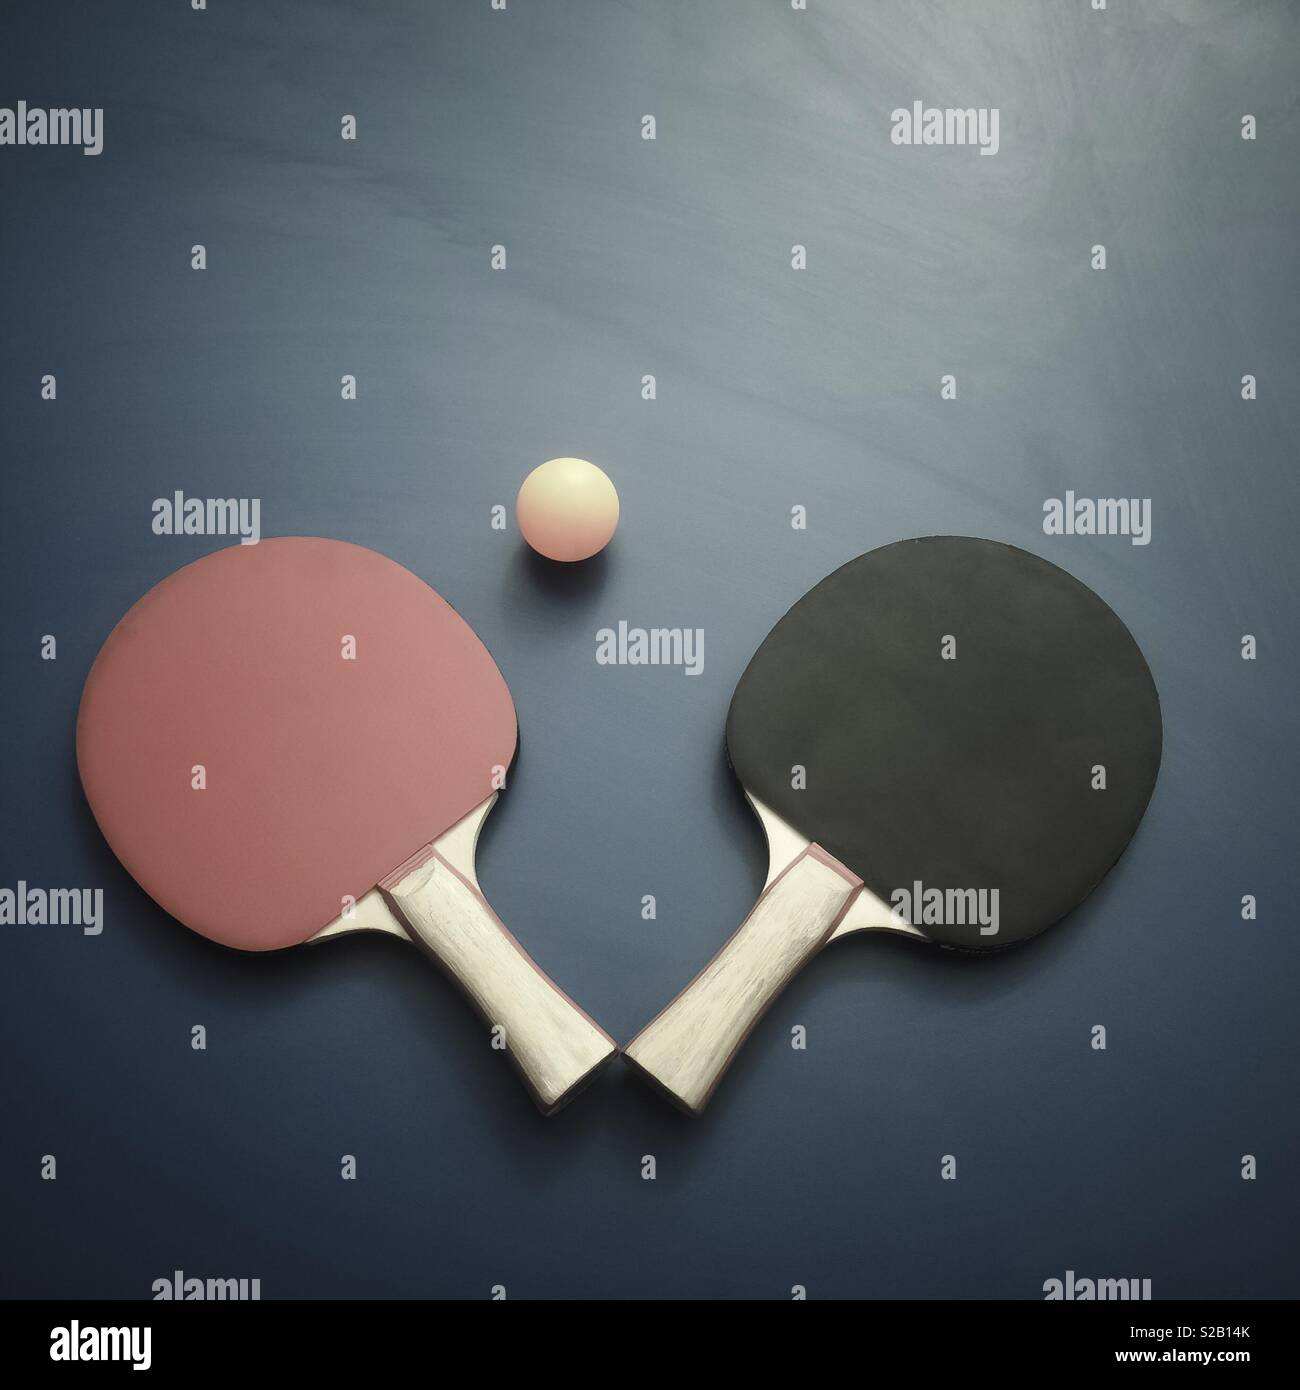 Kreative Fotografie von Ping pong Paddles und Kugel Stockbild